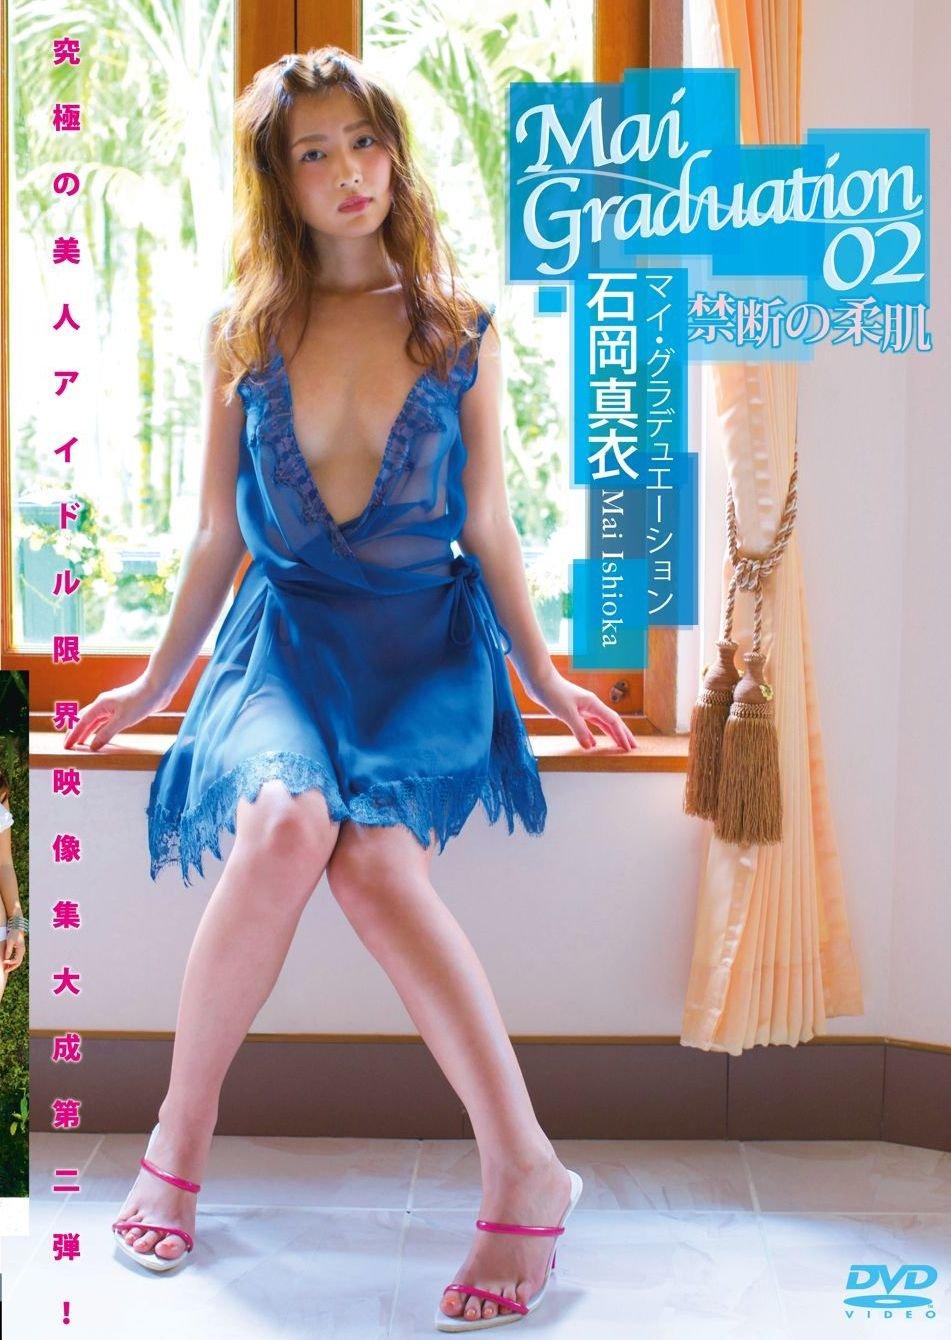 石岡真衣 DVD ≪Mai Graduation 02 禁断の柔肌≫ (発売日 2017/7/28)